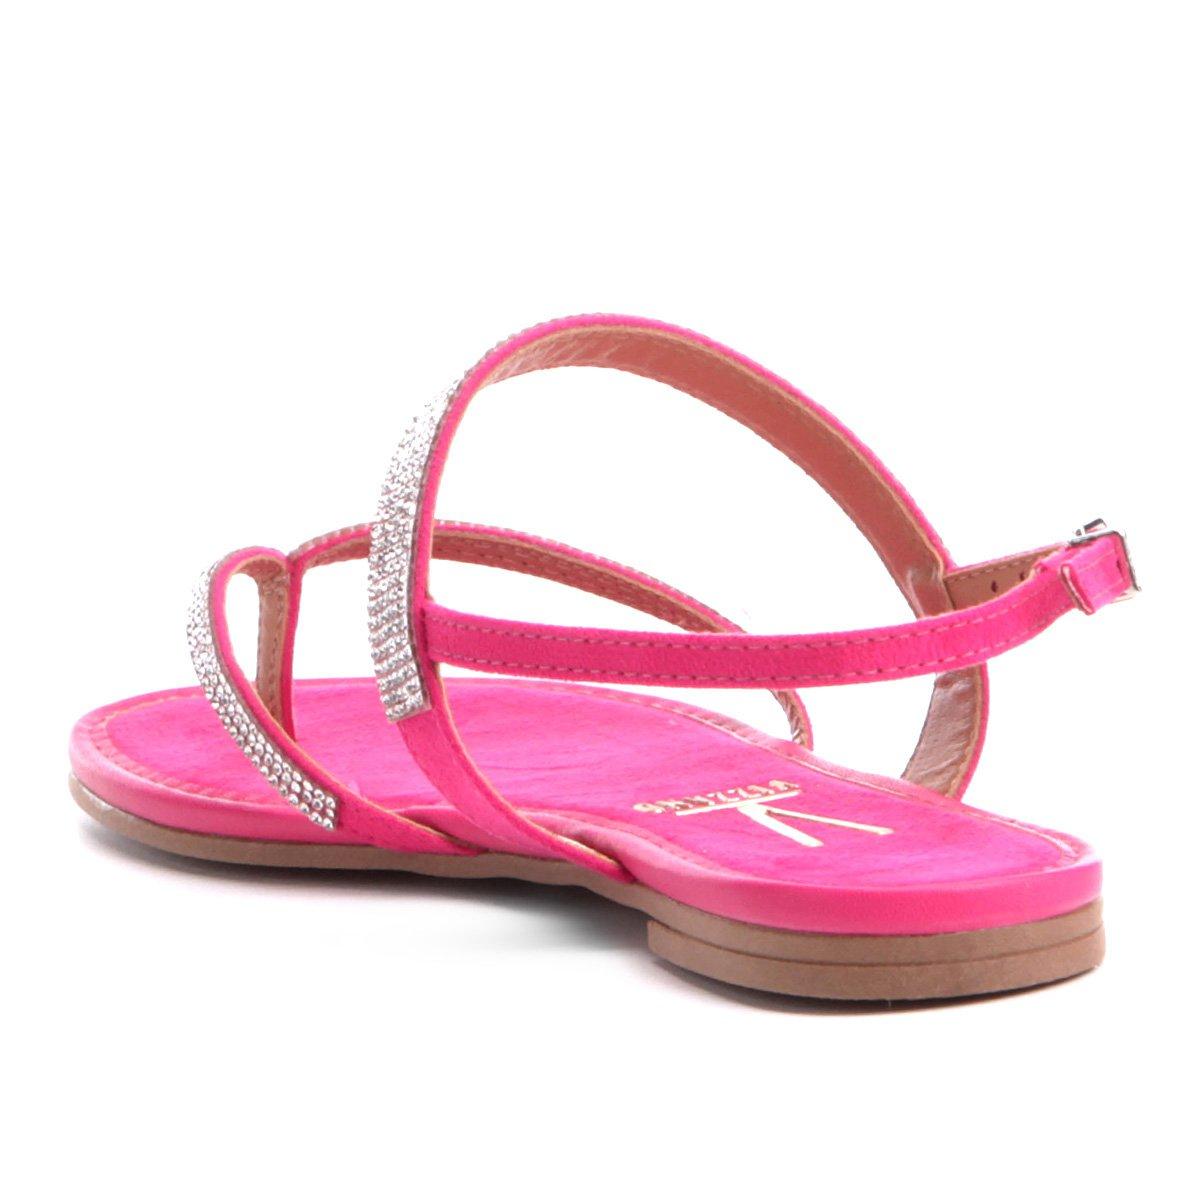 Vizzano Rasteira Strass Pink Rasteira Rasteira Vizzano Tira Tira Vizzano Strass Tira Pink 88AOTf